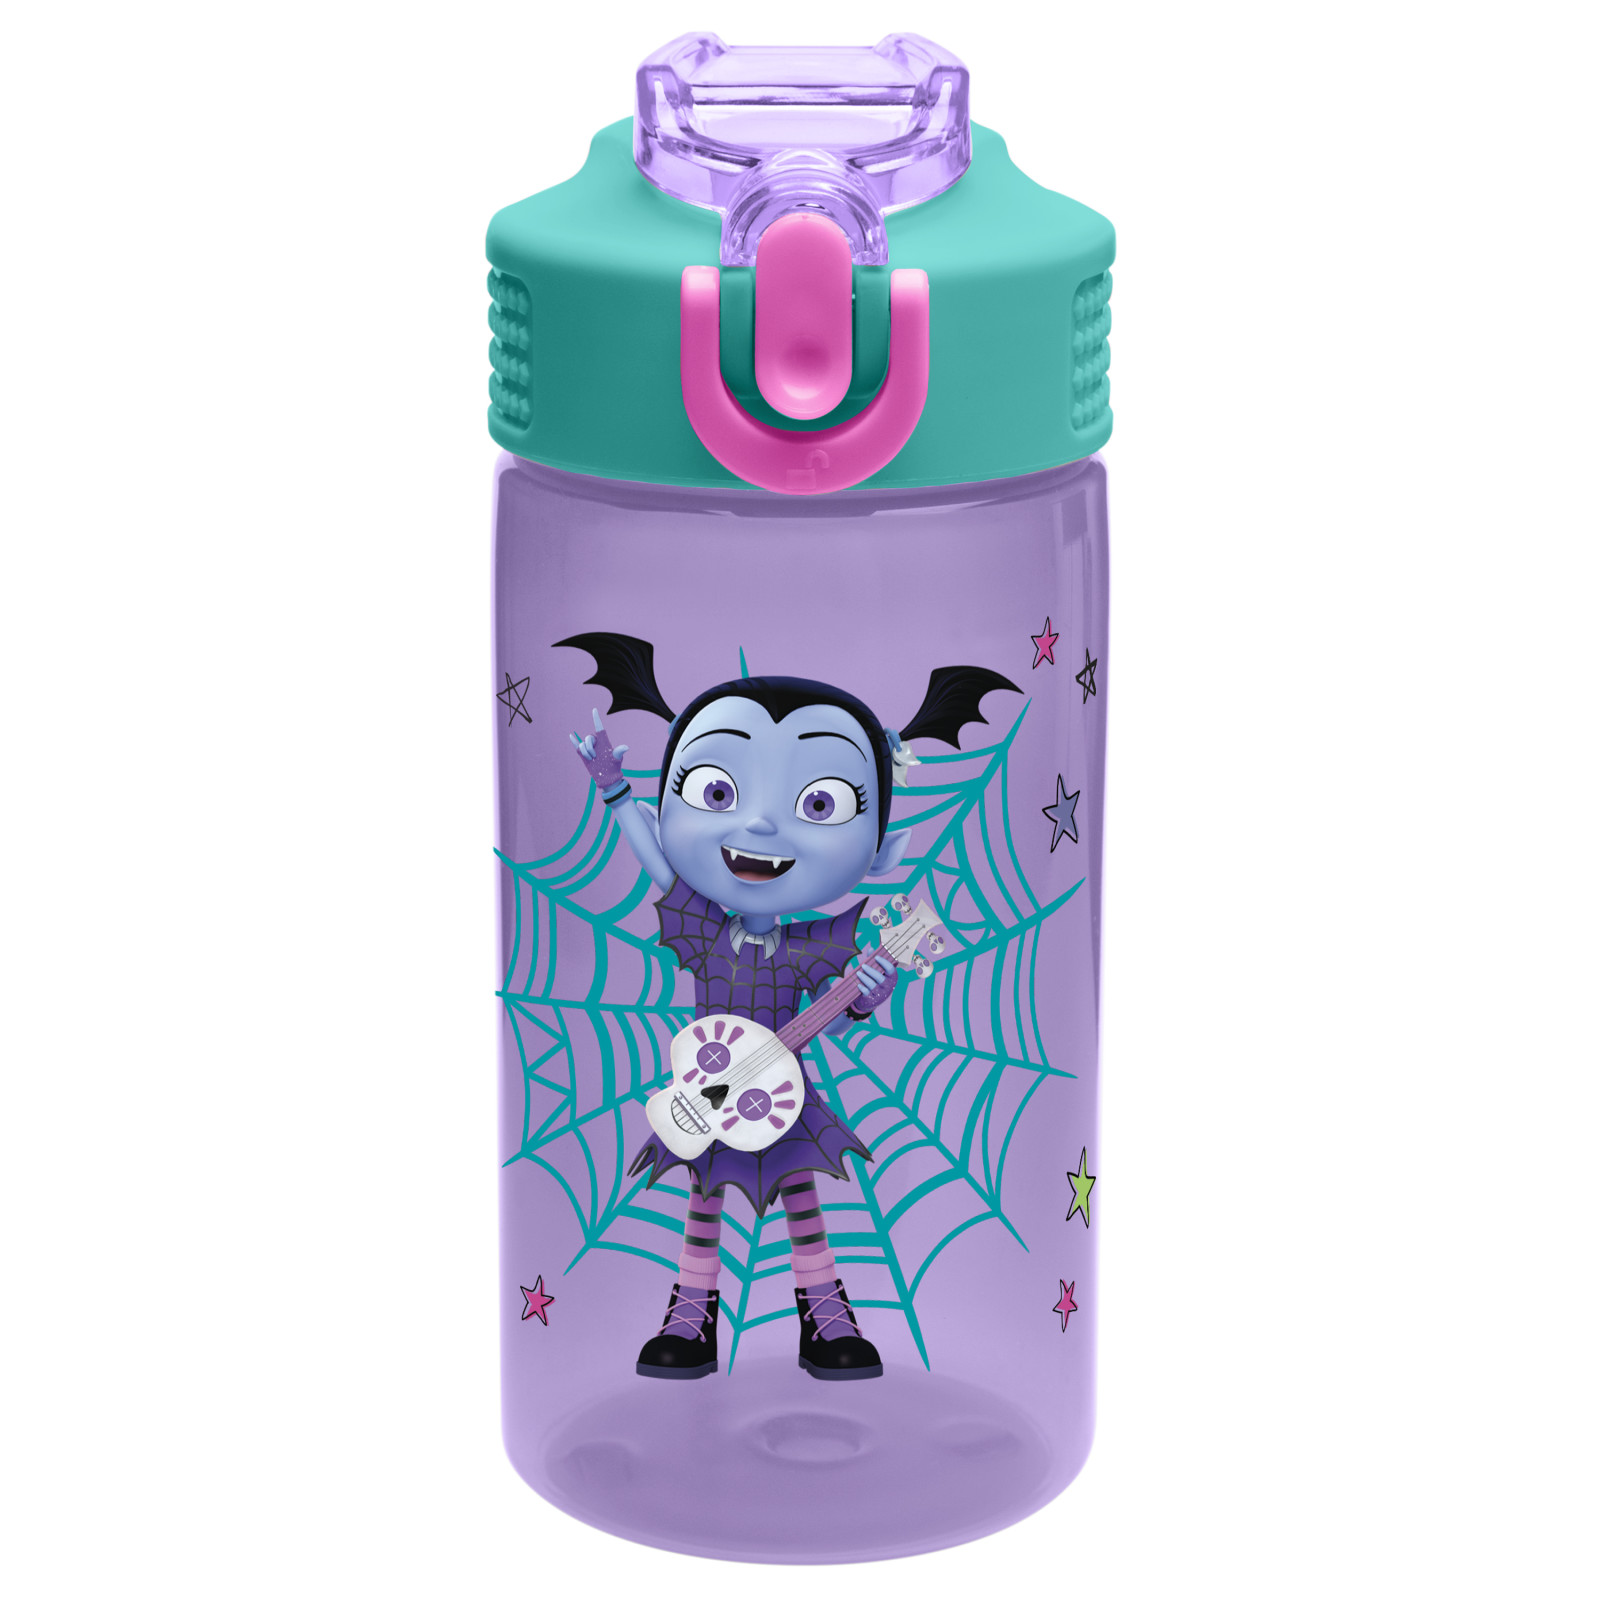 Nick Jr. 16 ounce Water Bottle, Vampirina slideshow image 2